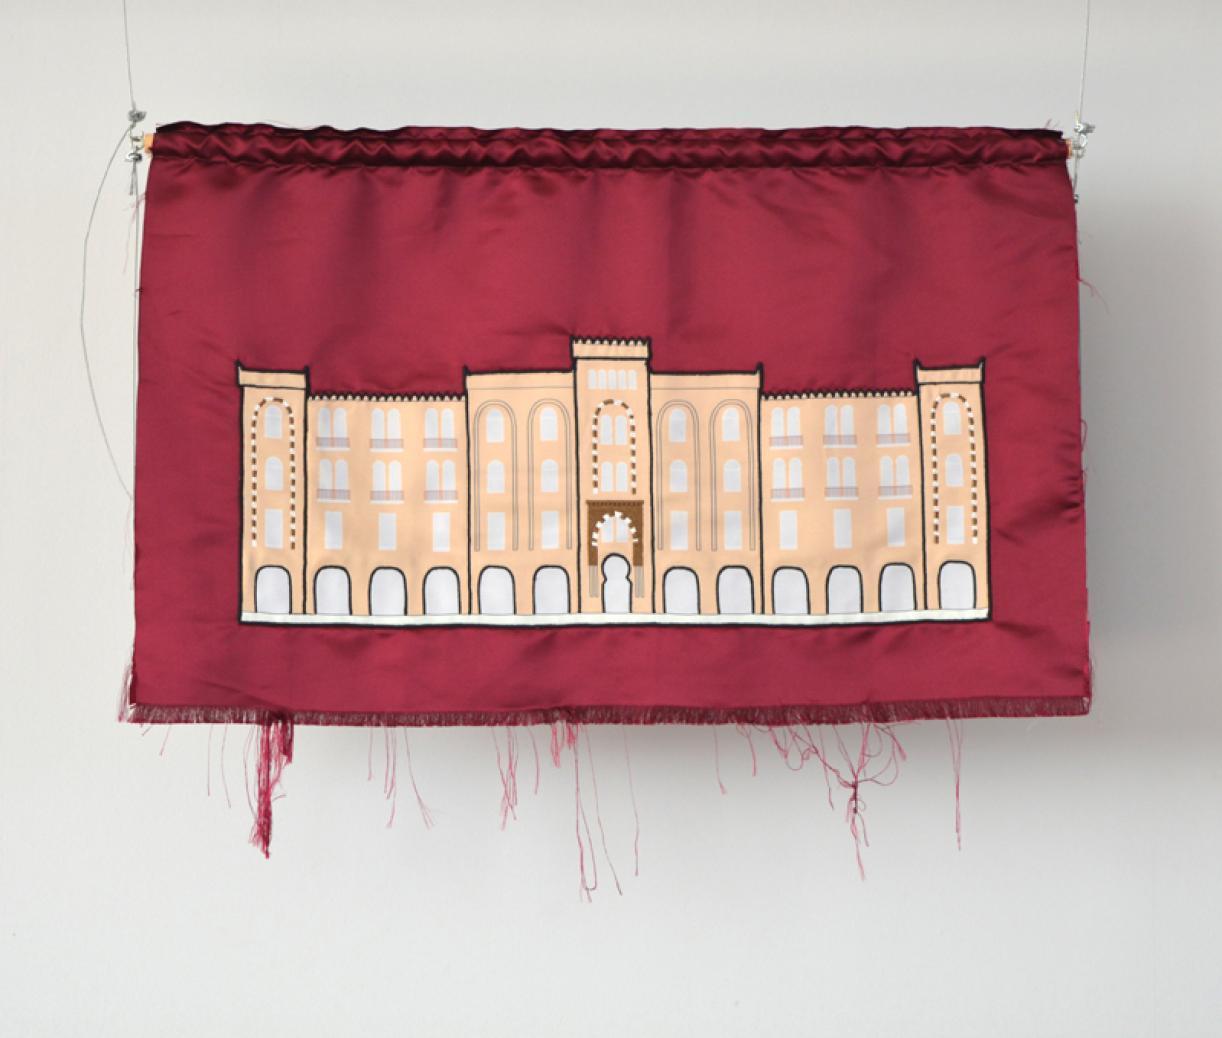 Blazon: Nijmeh, Baladiyyet Beirut, 2015, Embroidery and applique on textile, 58 x 93 cm, Ed. 3 + 2 AP